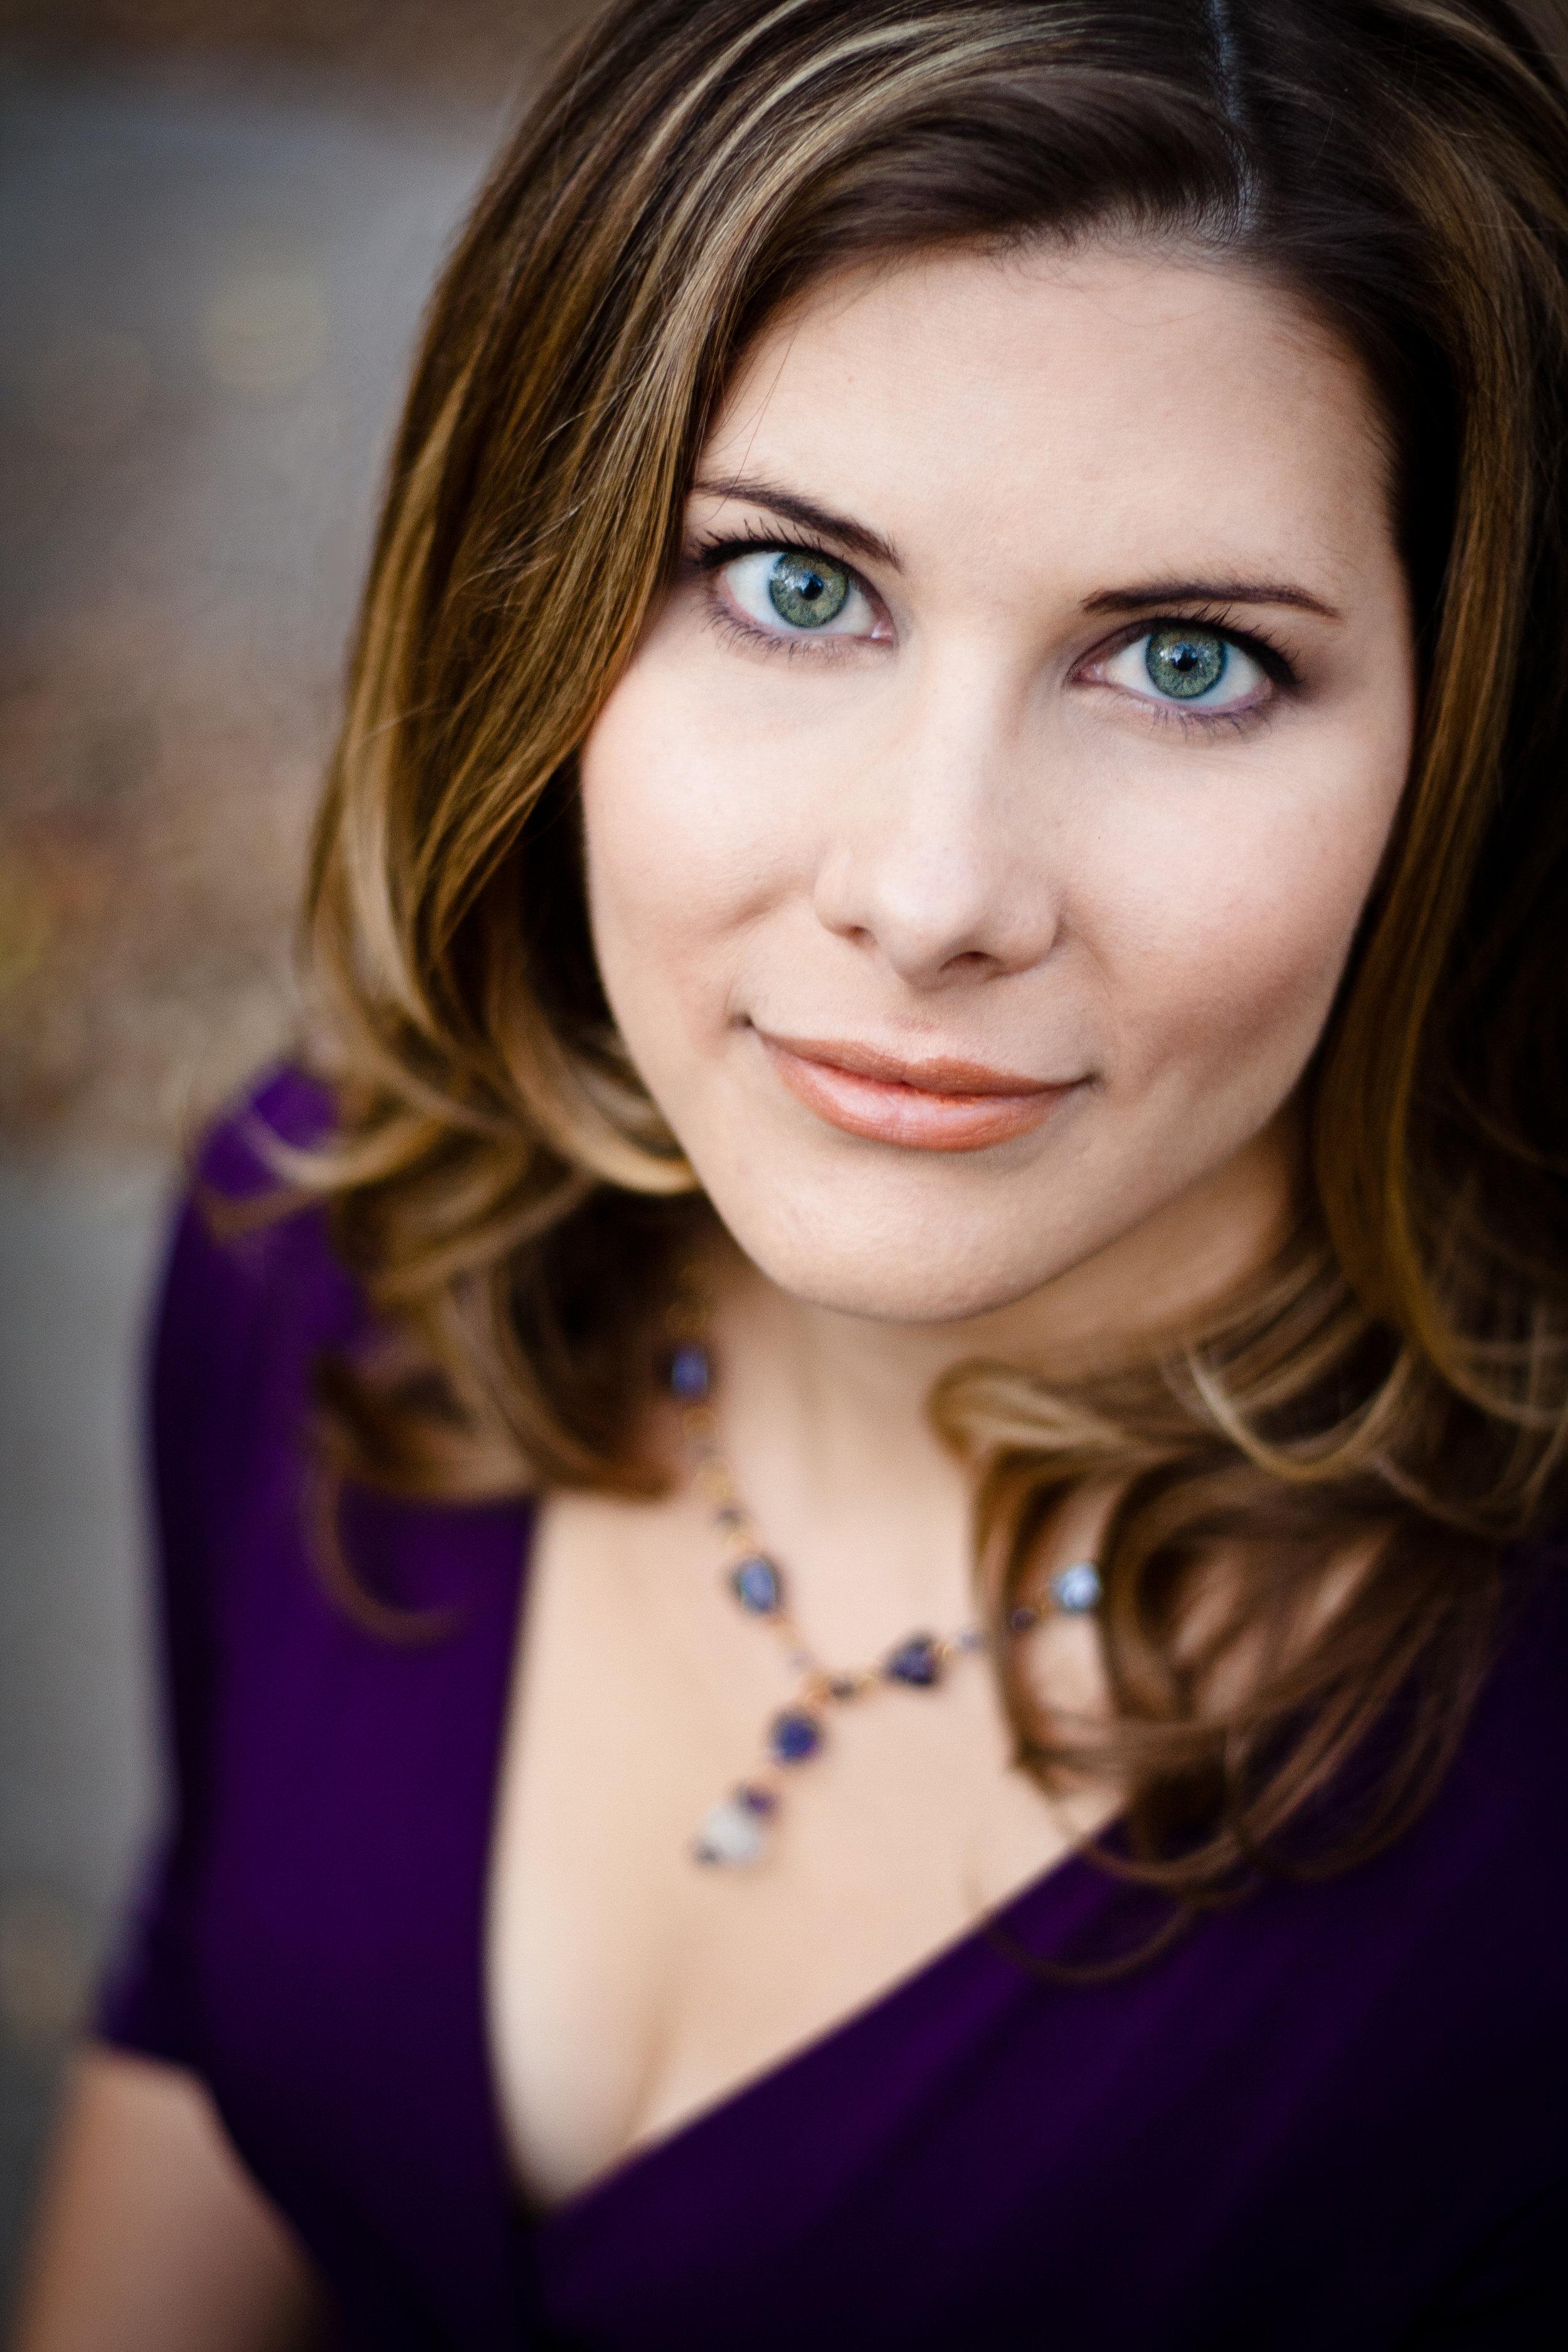 Angela Young Smucker